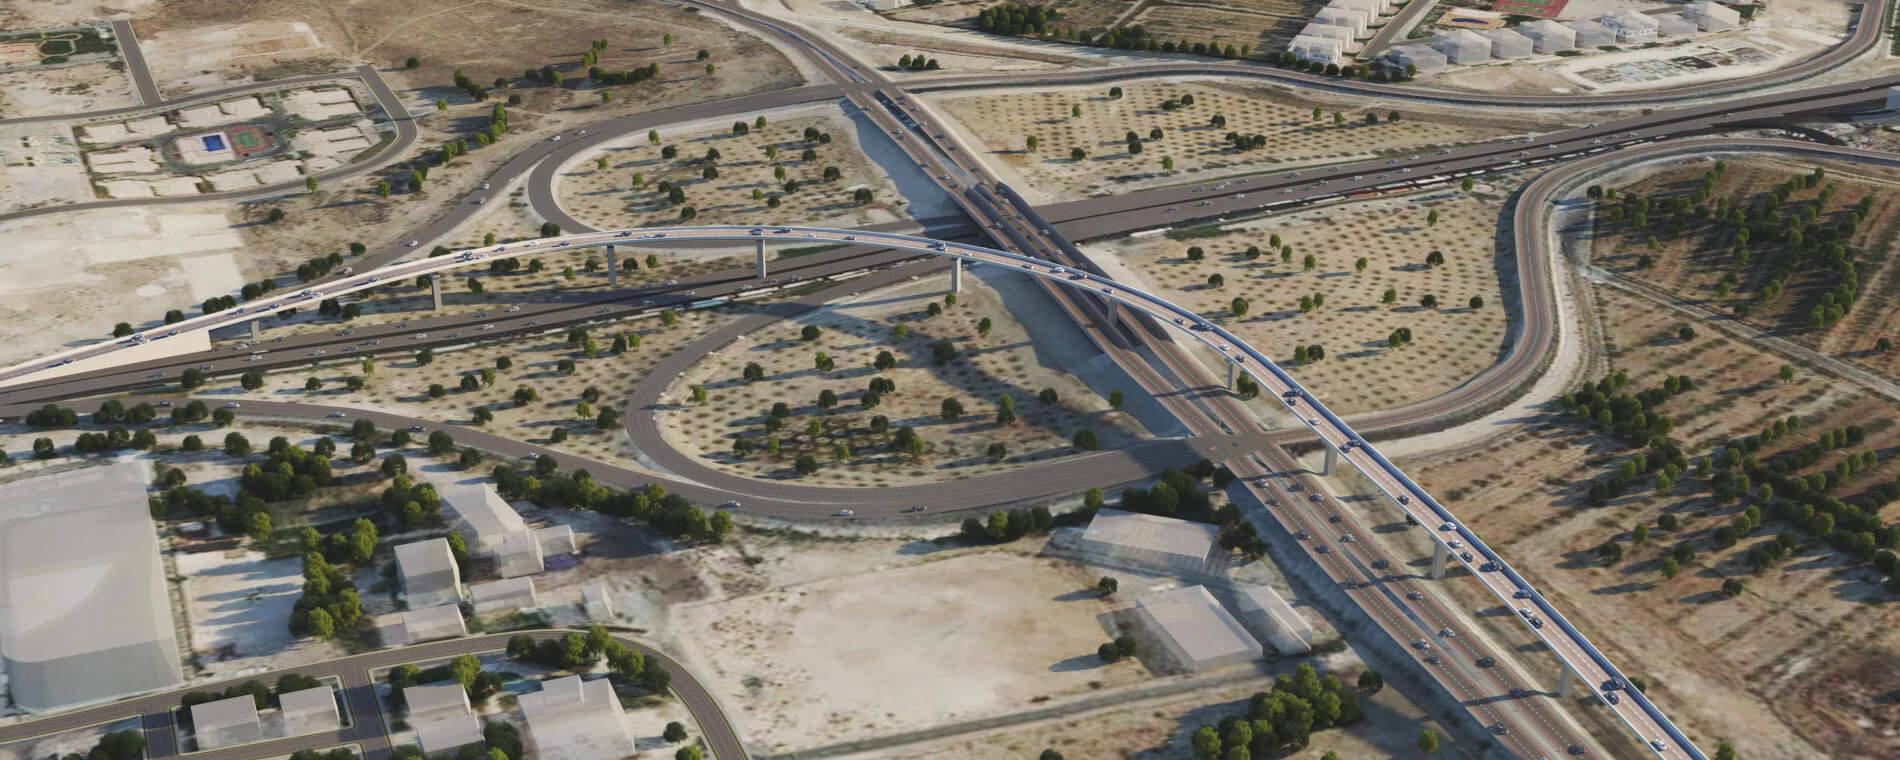 Widening of Sheikh Isa Bin Salman Highway and Jasrah Interchange Upgrade – AMAS Package 4 0